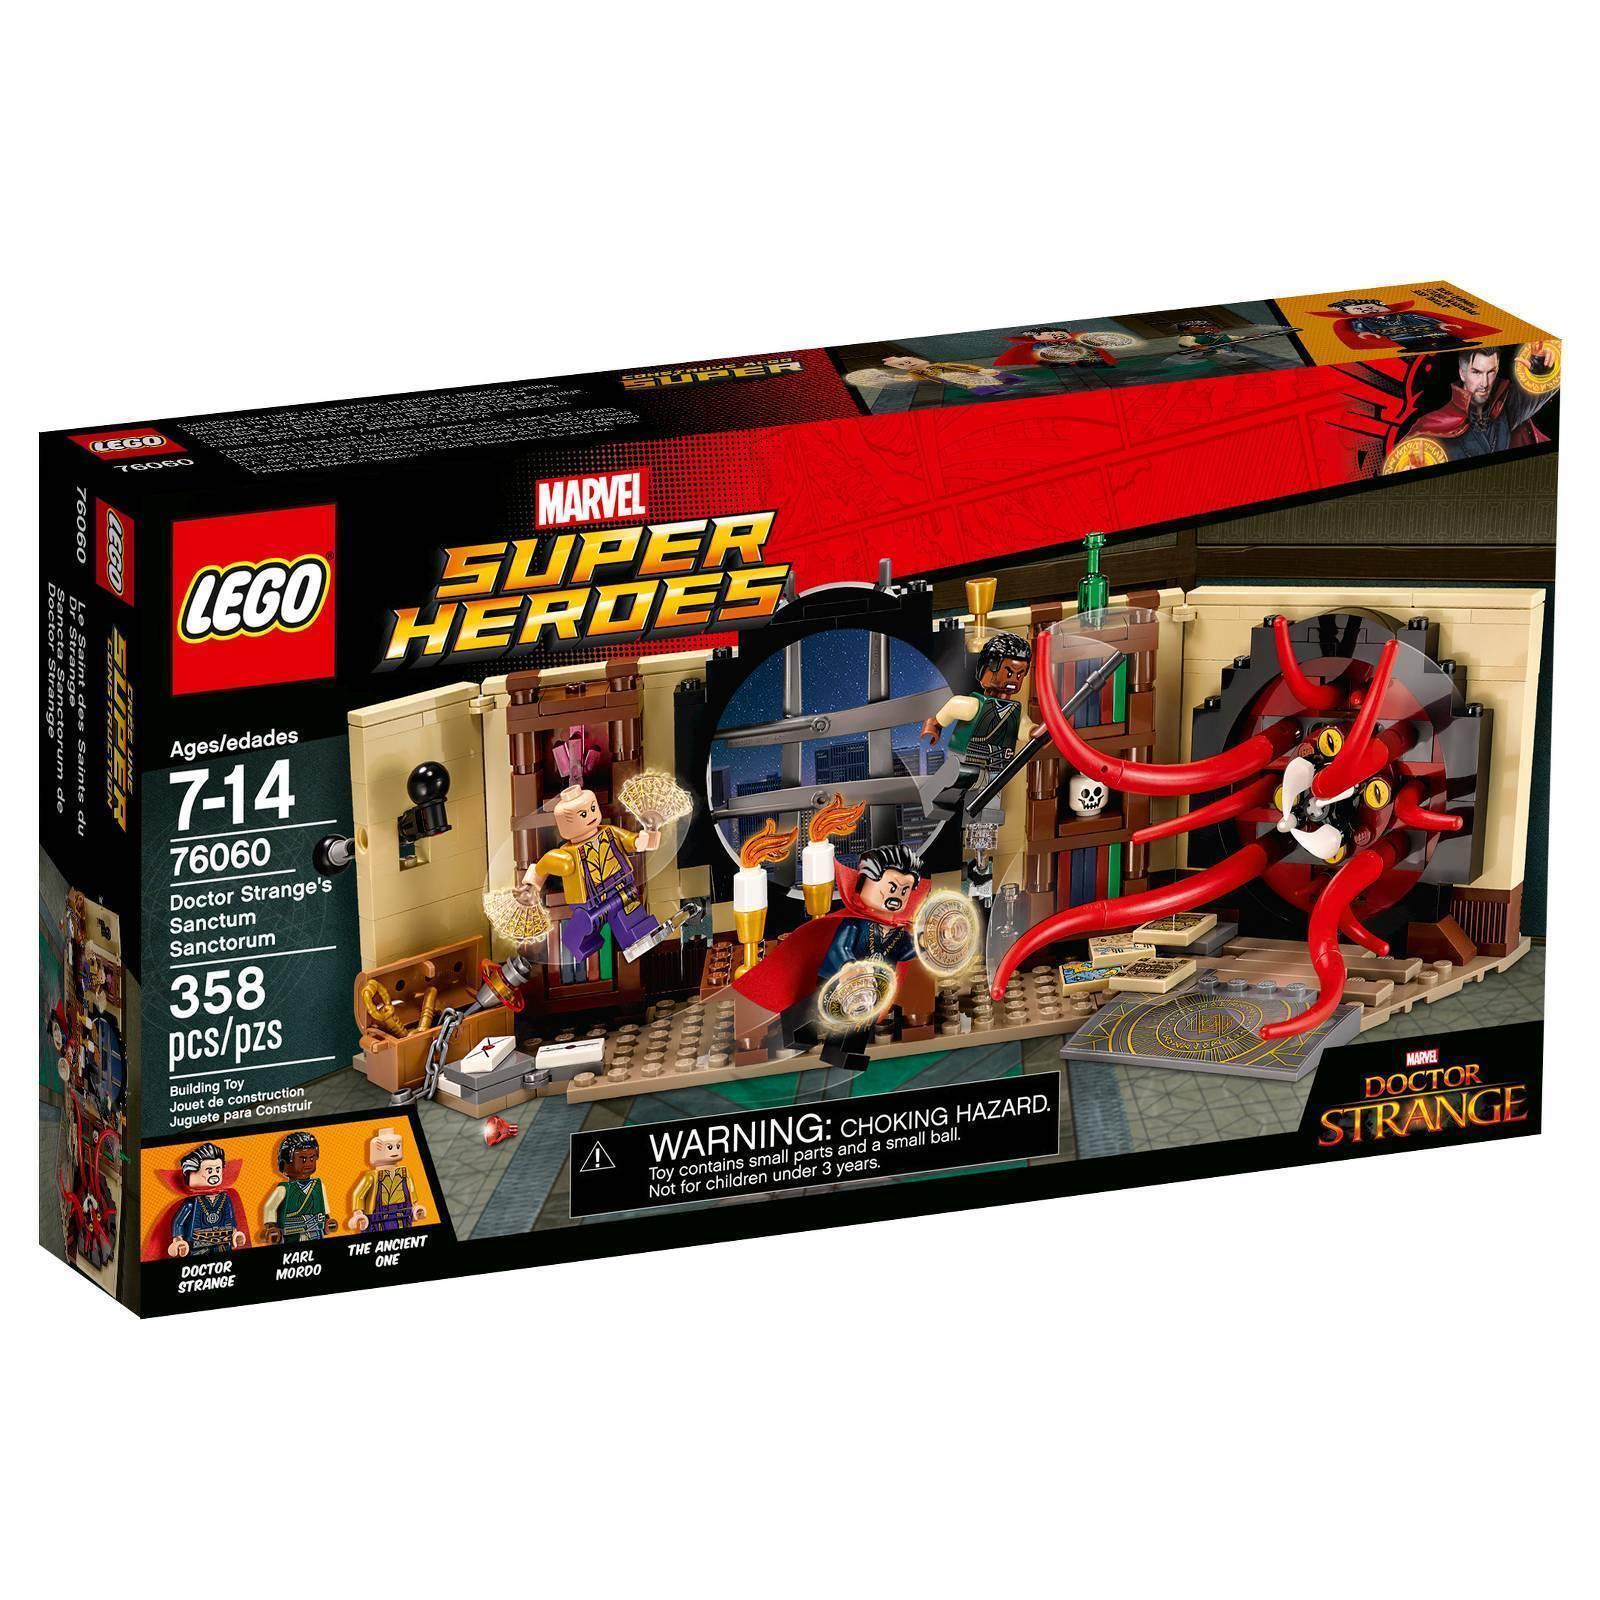 76060 76060 76060 DOCTOR STRANGE'S SANCTUM SANCTORUM lego NEW marvel heroes legos set DR. 0cc7a3